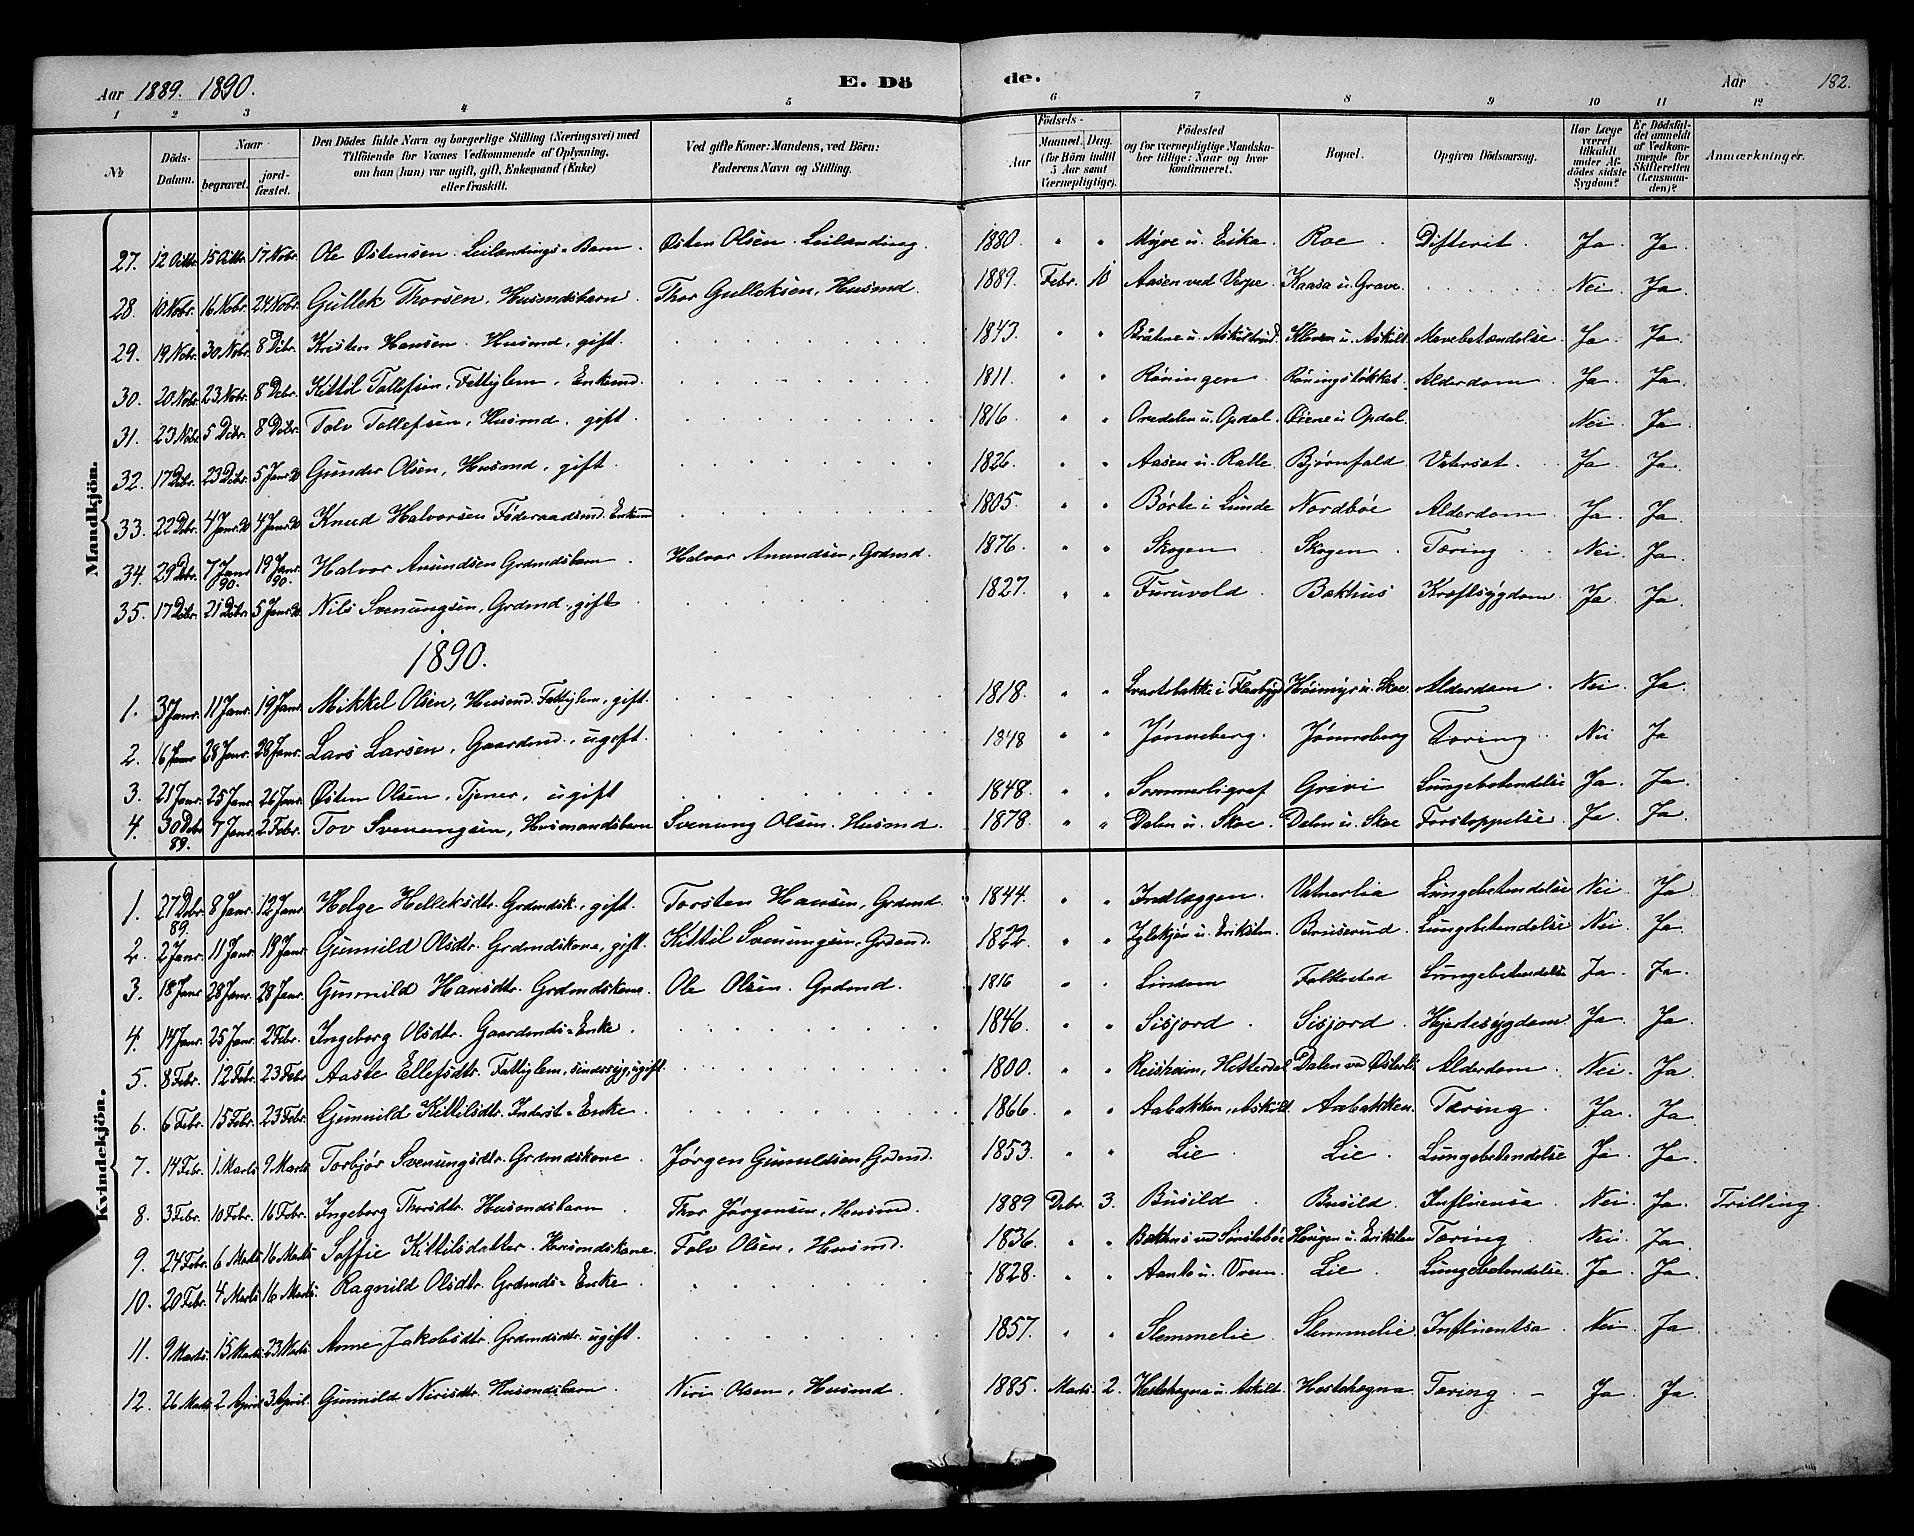 SAKO, Bø kirkebøker, G/Ga/L0005: Klokkerbok nr. 5, 1883-1897, s. 182